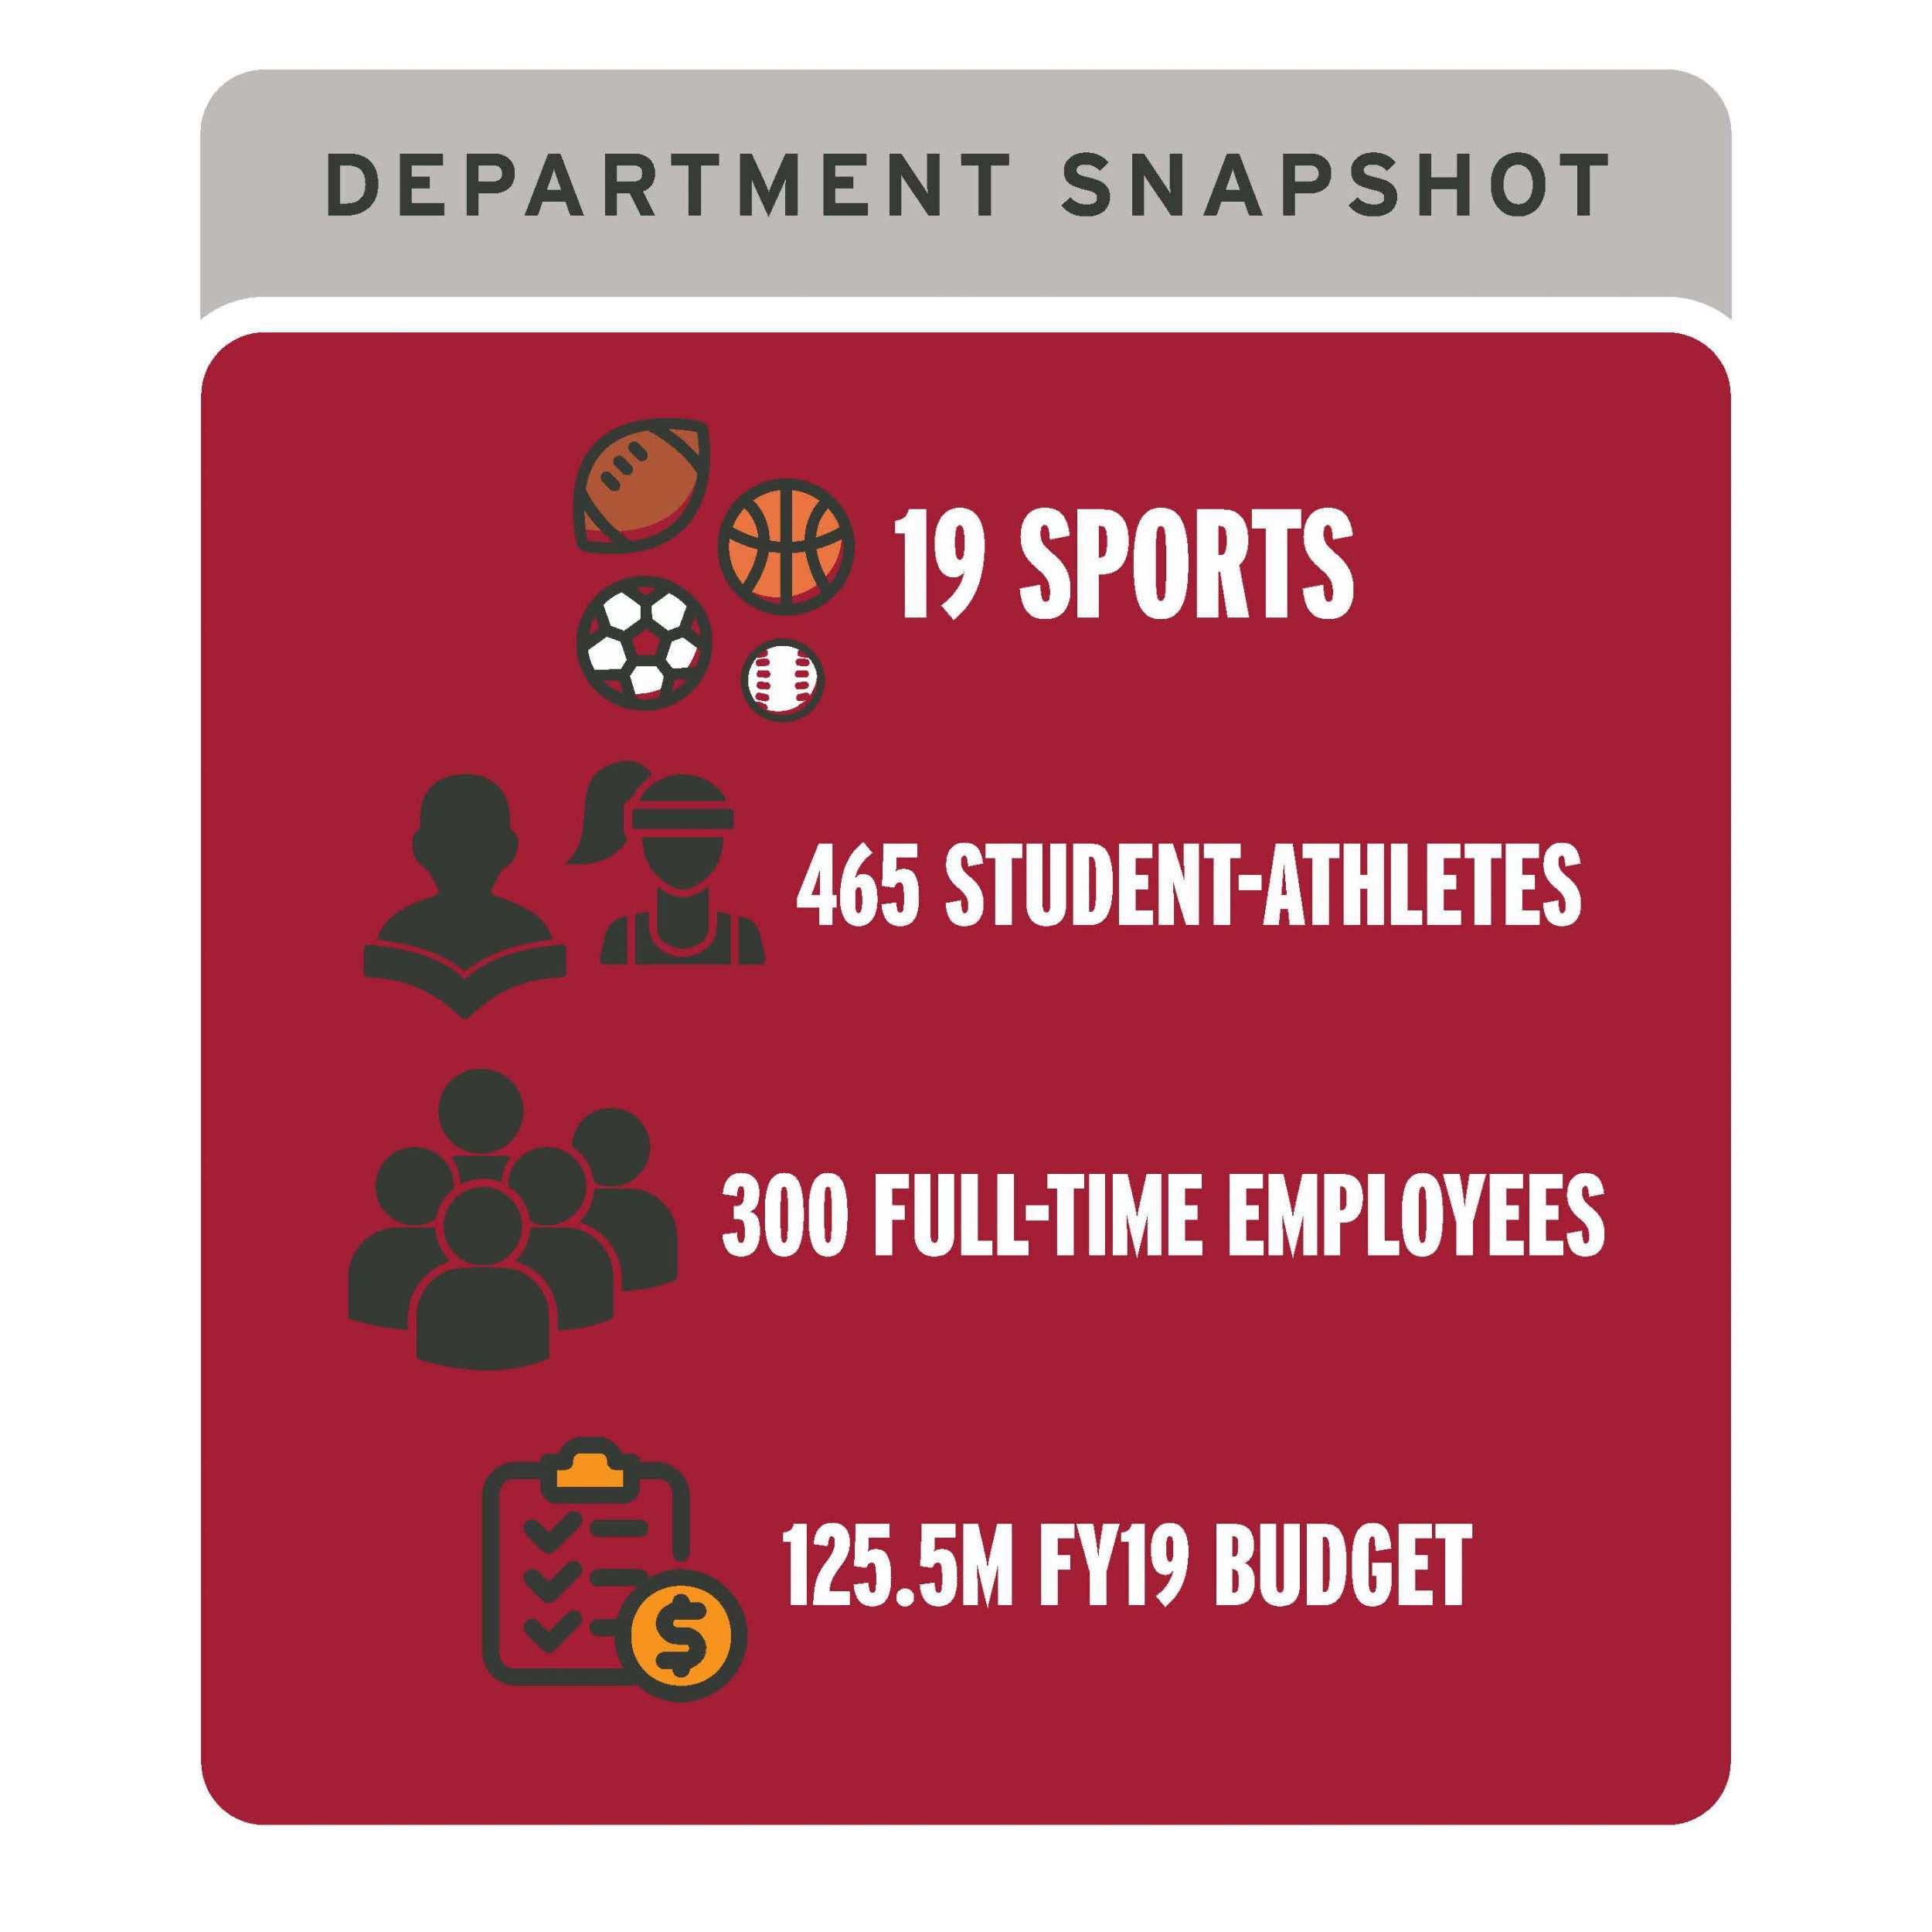 Department Snapshot